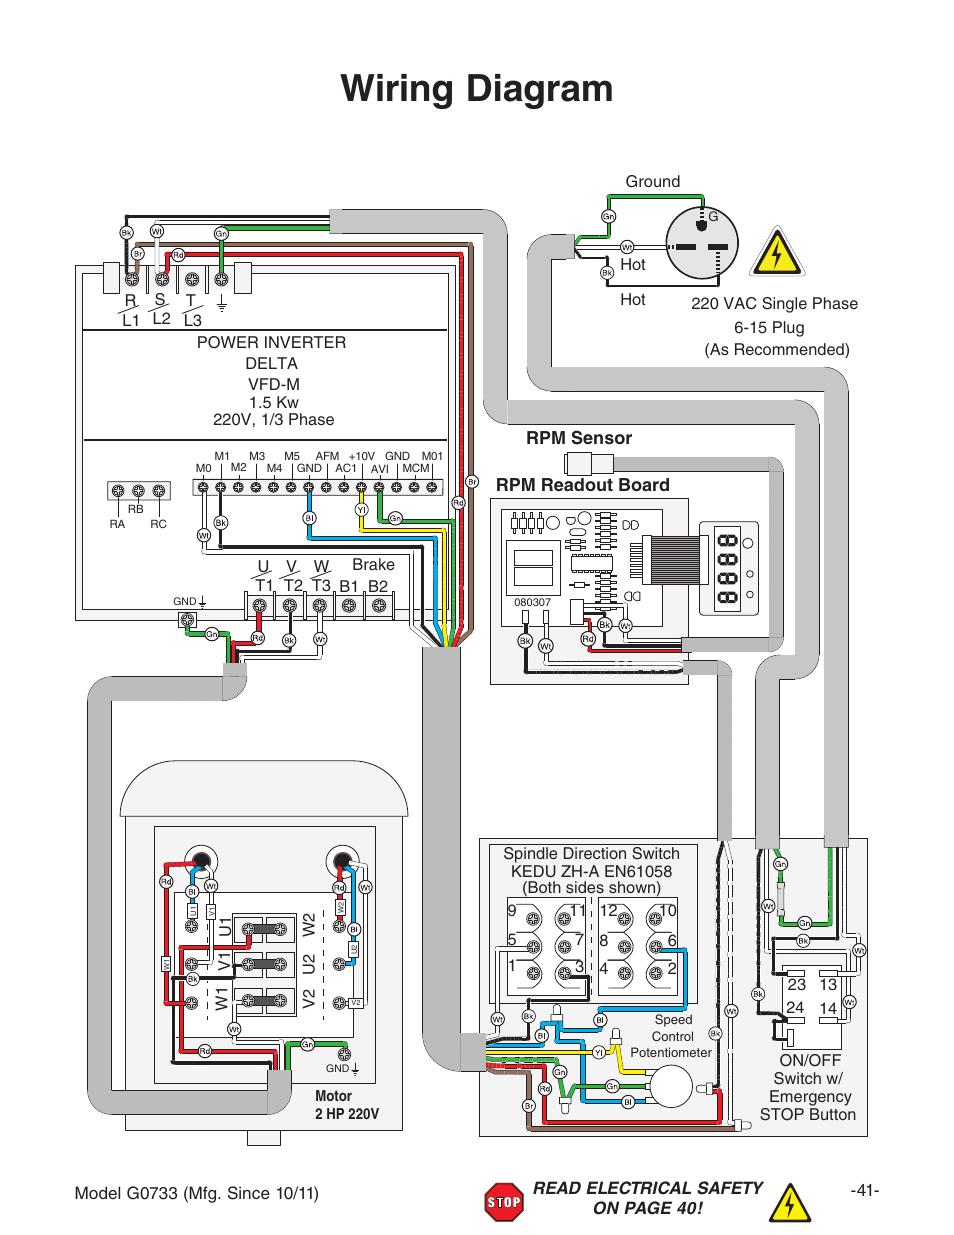 medium resolution of kedu zh hc 3 wiring diagram wiring diagram third level kedu switch wiring diagram kedu switch wiring diagram